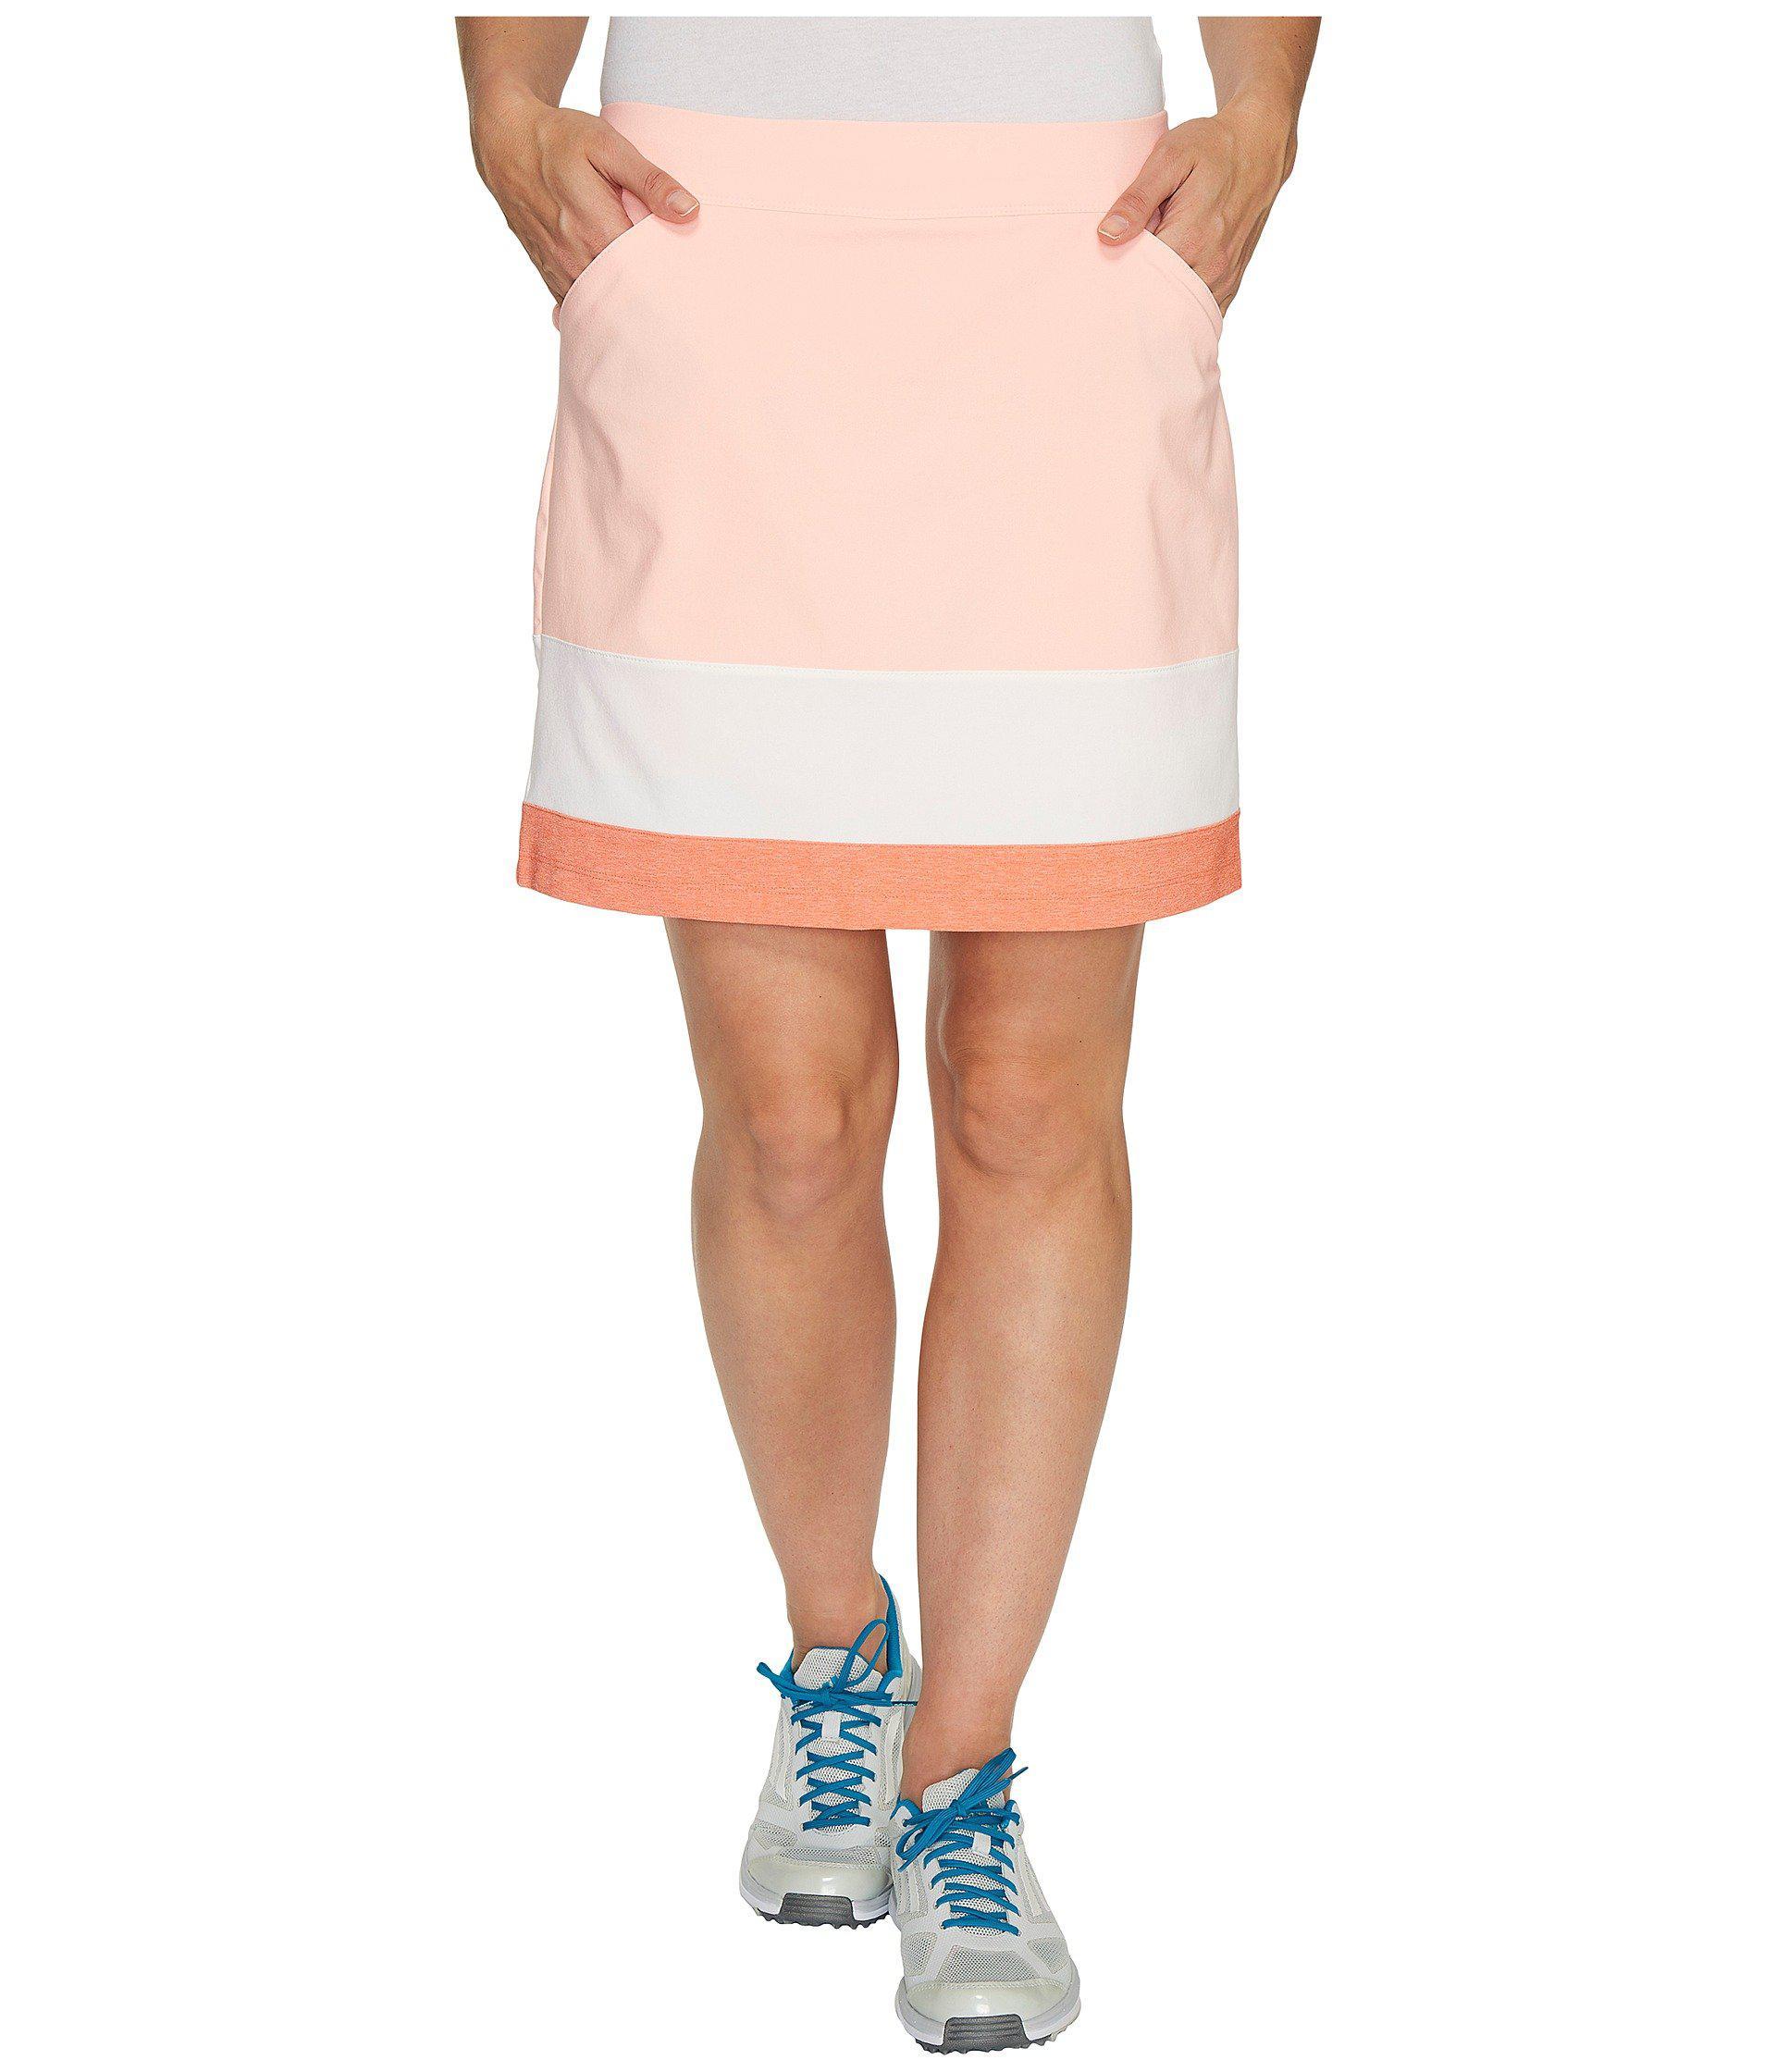 ec4fda4cb71d adidas Originals Ultimate Adistar Color Block Skort in Pink - Lyst